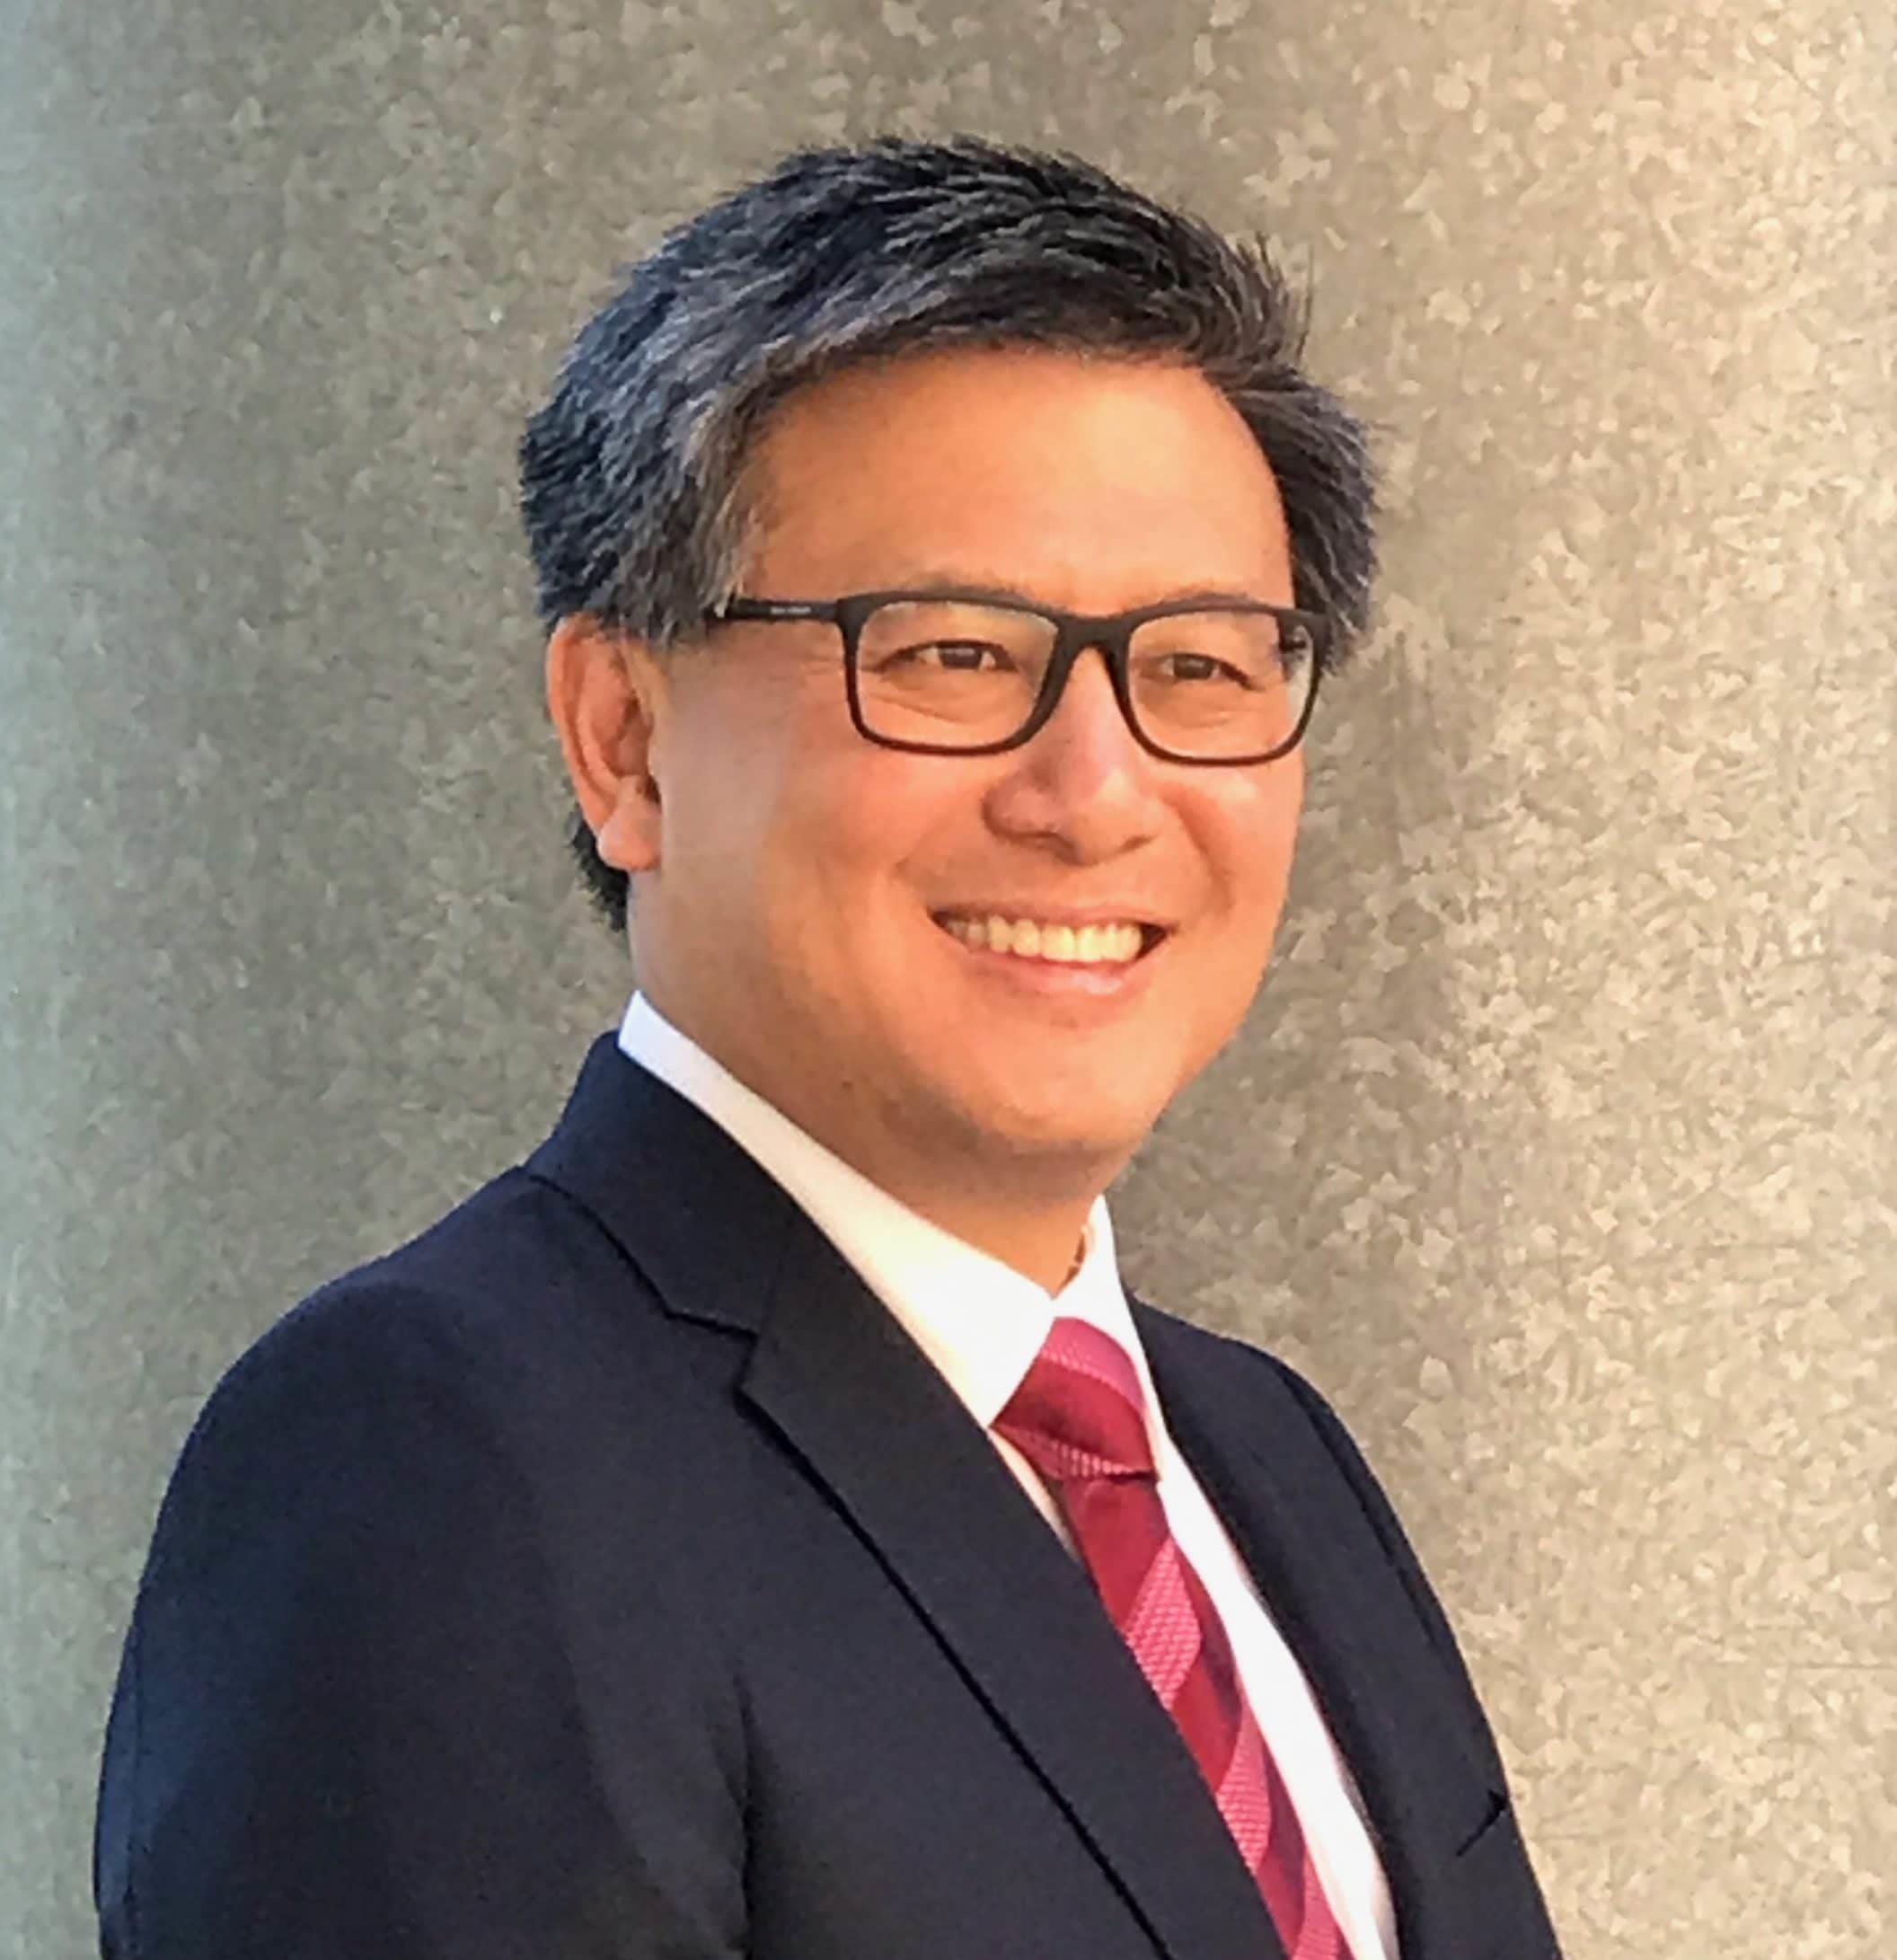 John Chiang